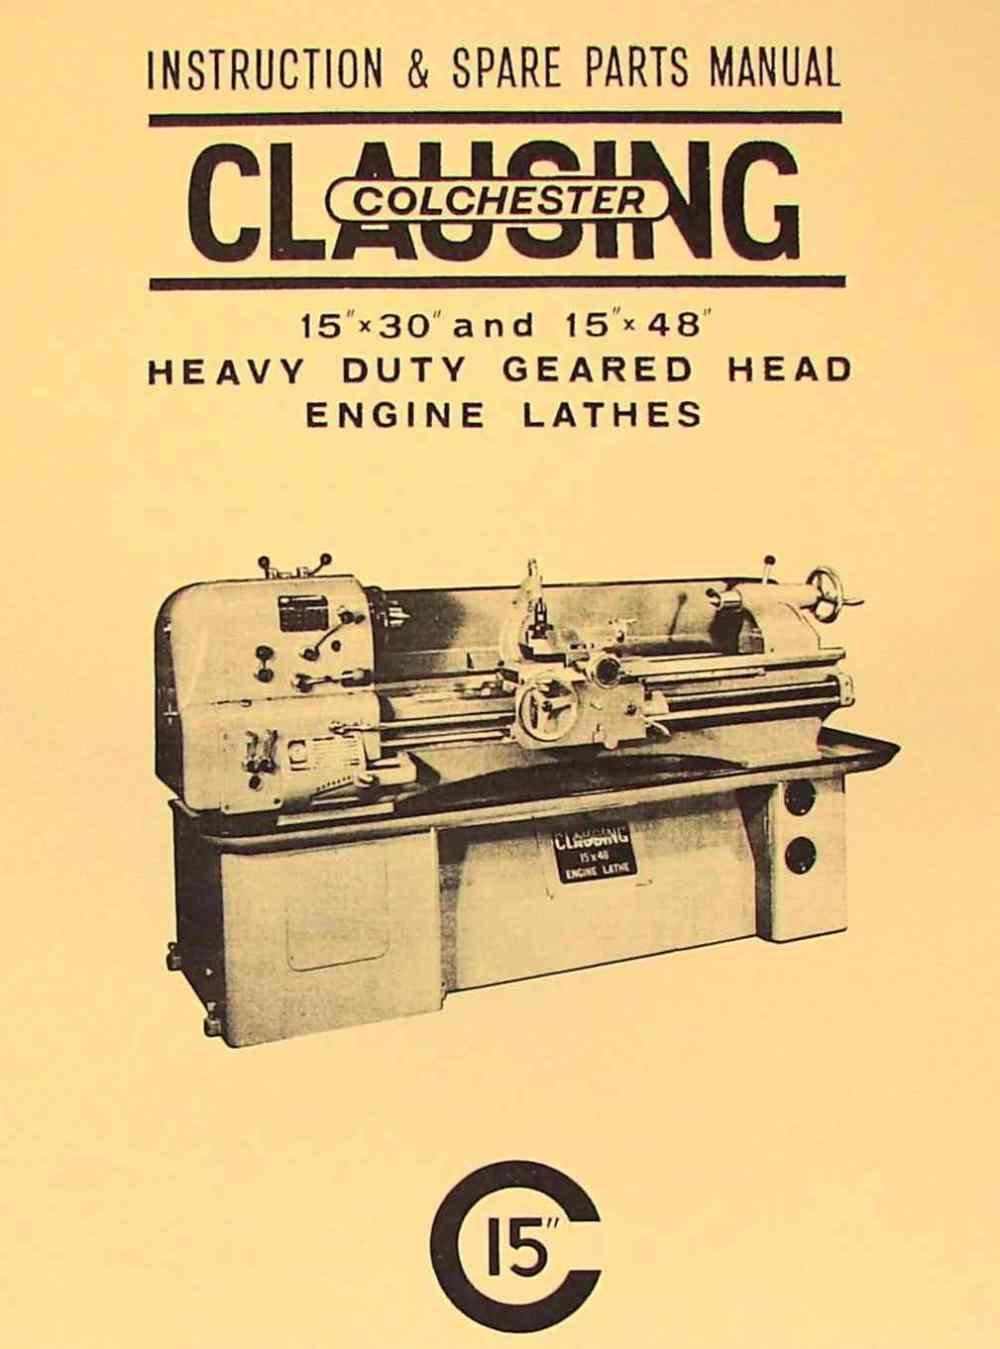 medium resolution of clausing colchester 15 x30 15 x48 metal lathe instruction part manual ozark tool manuals books